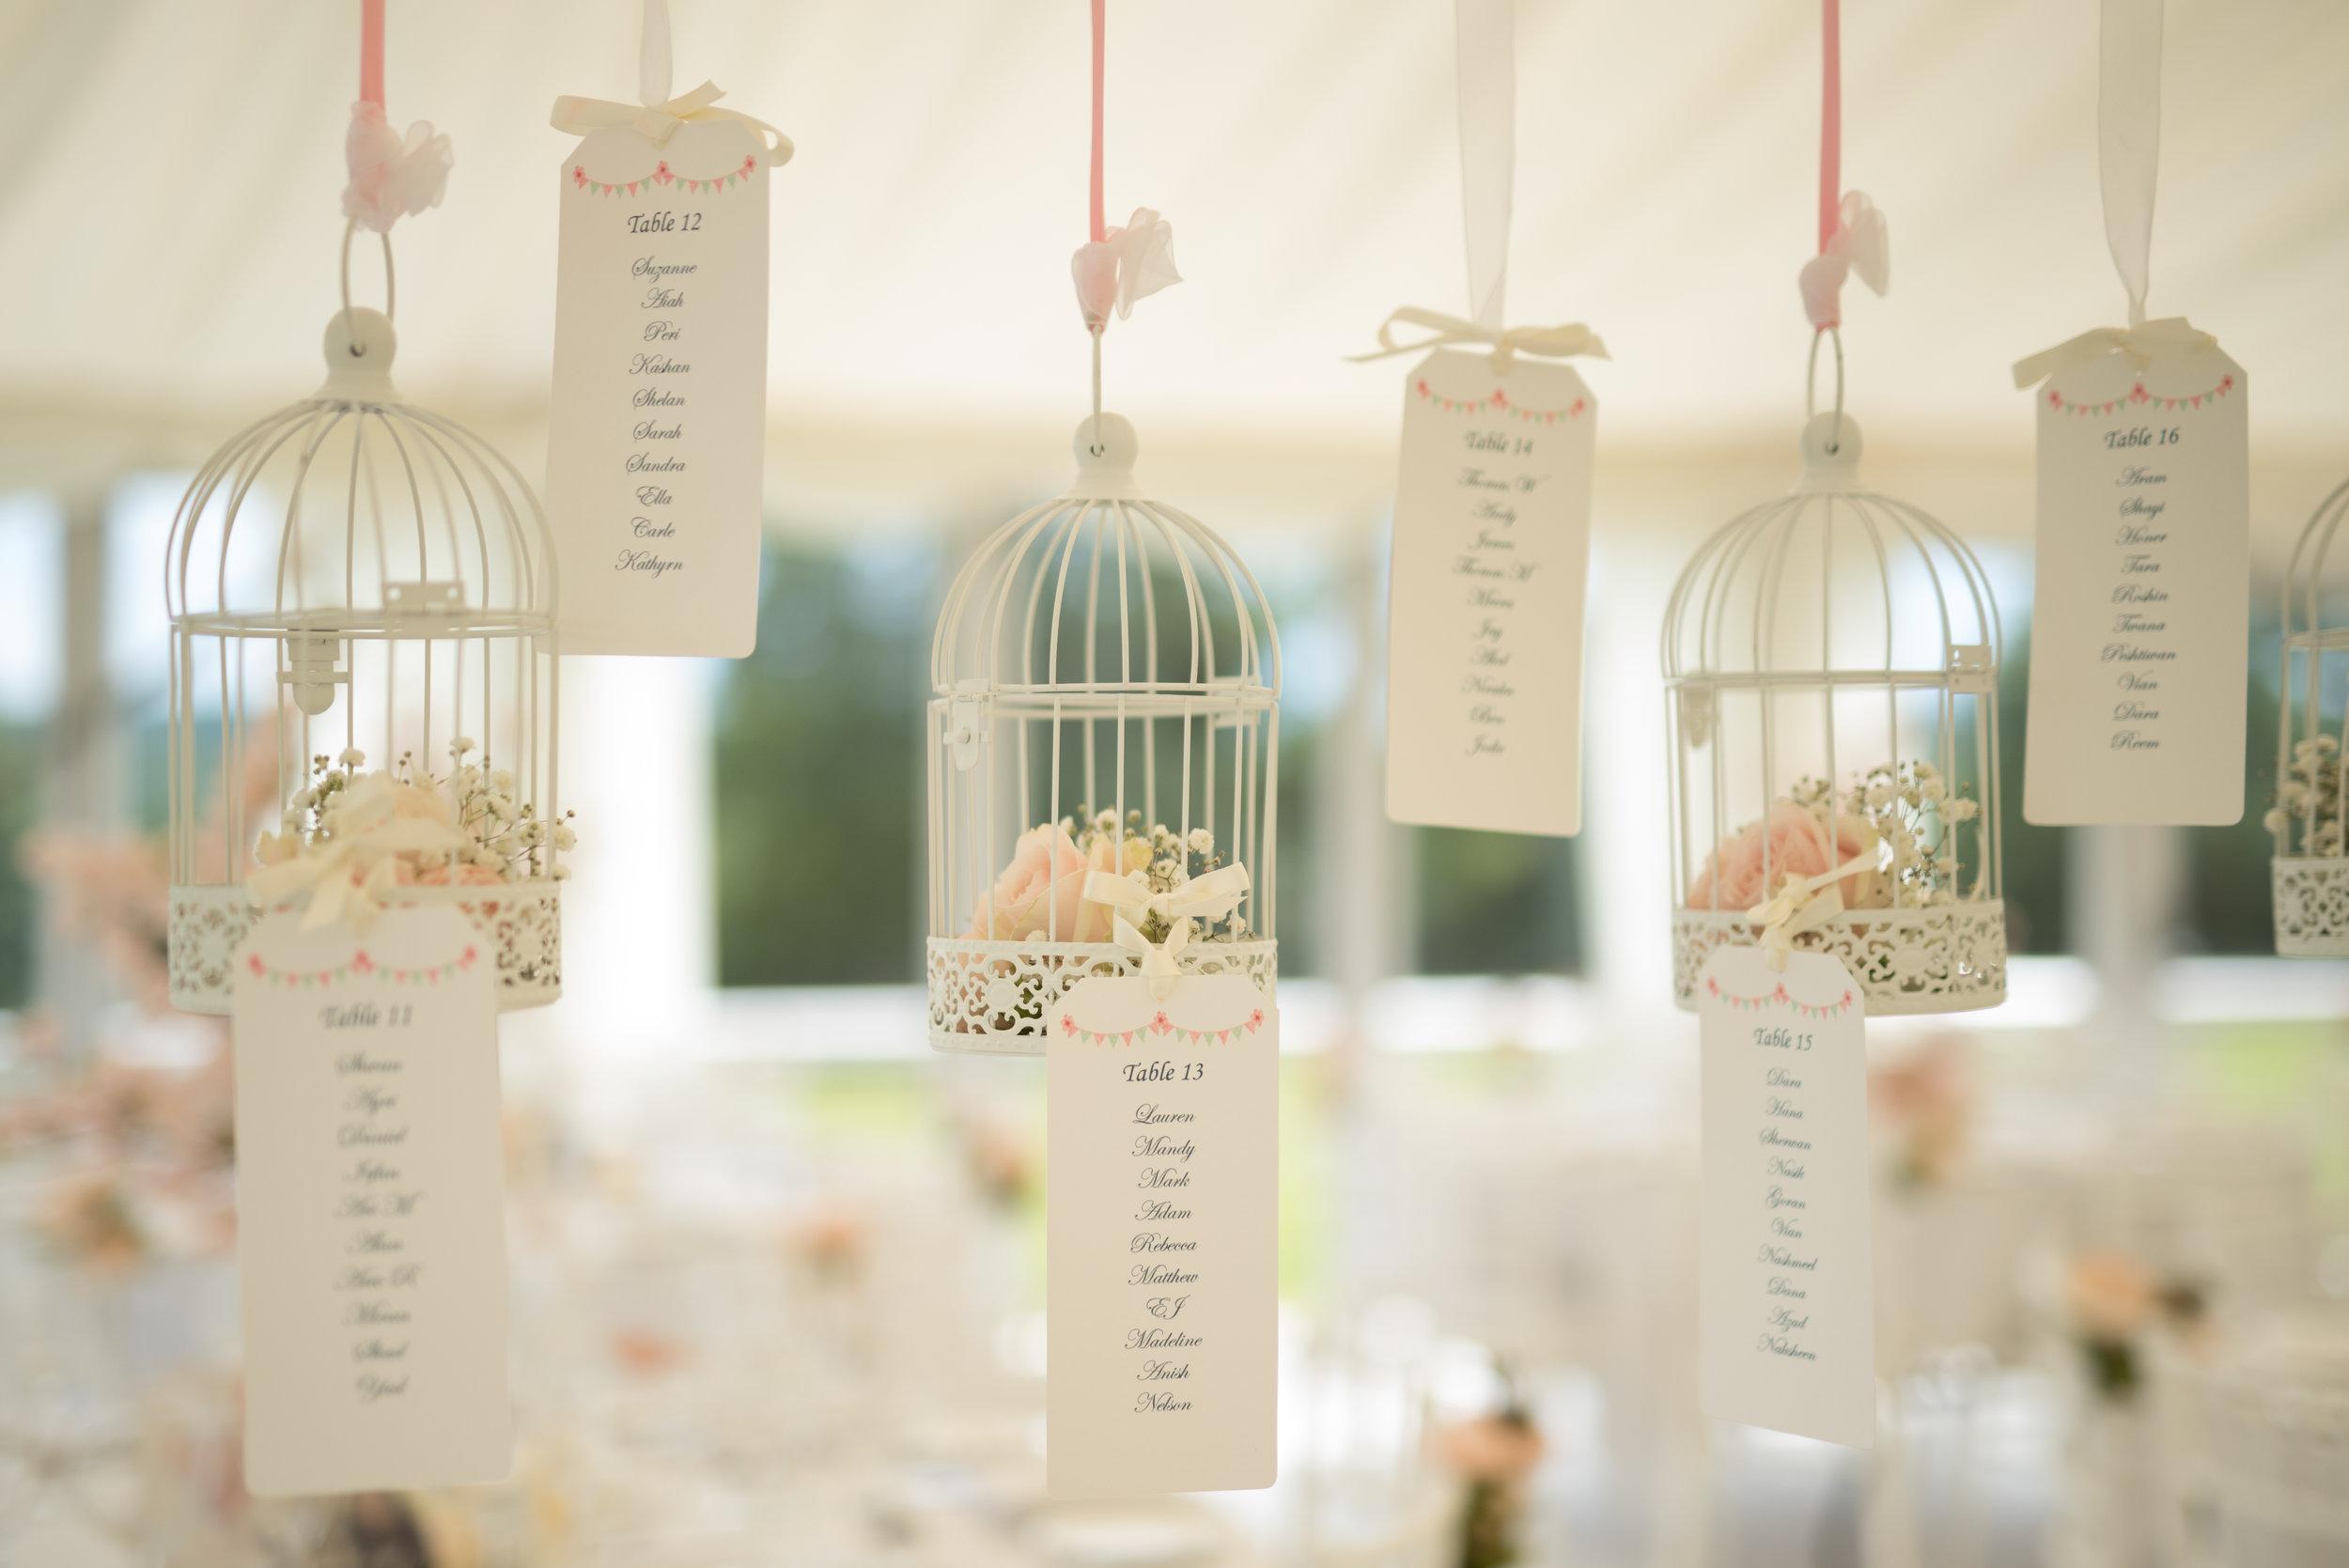 Danesfield House wedding, Danesfield House wedding photography, Danesfield House wedding photography, marquee wedding photography, marquee wedding Buckinghamshire, wedding table plan